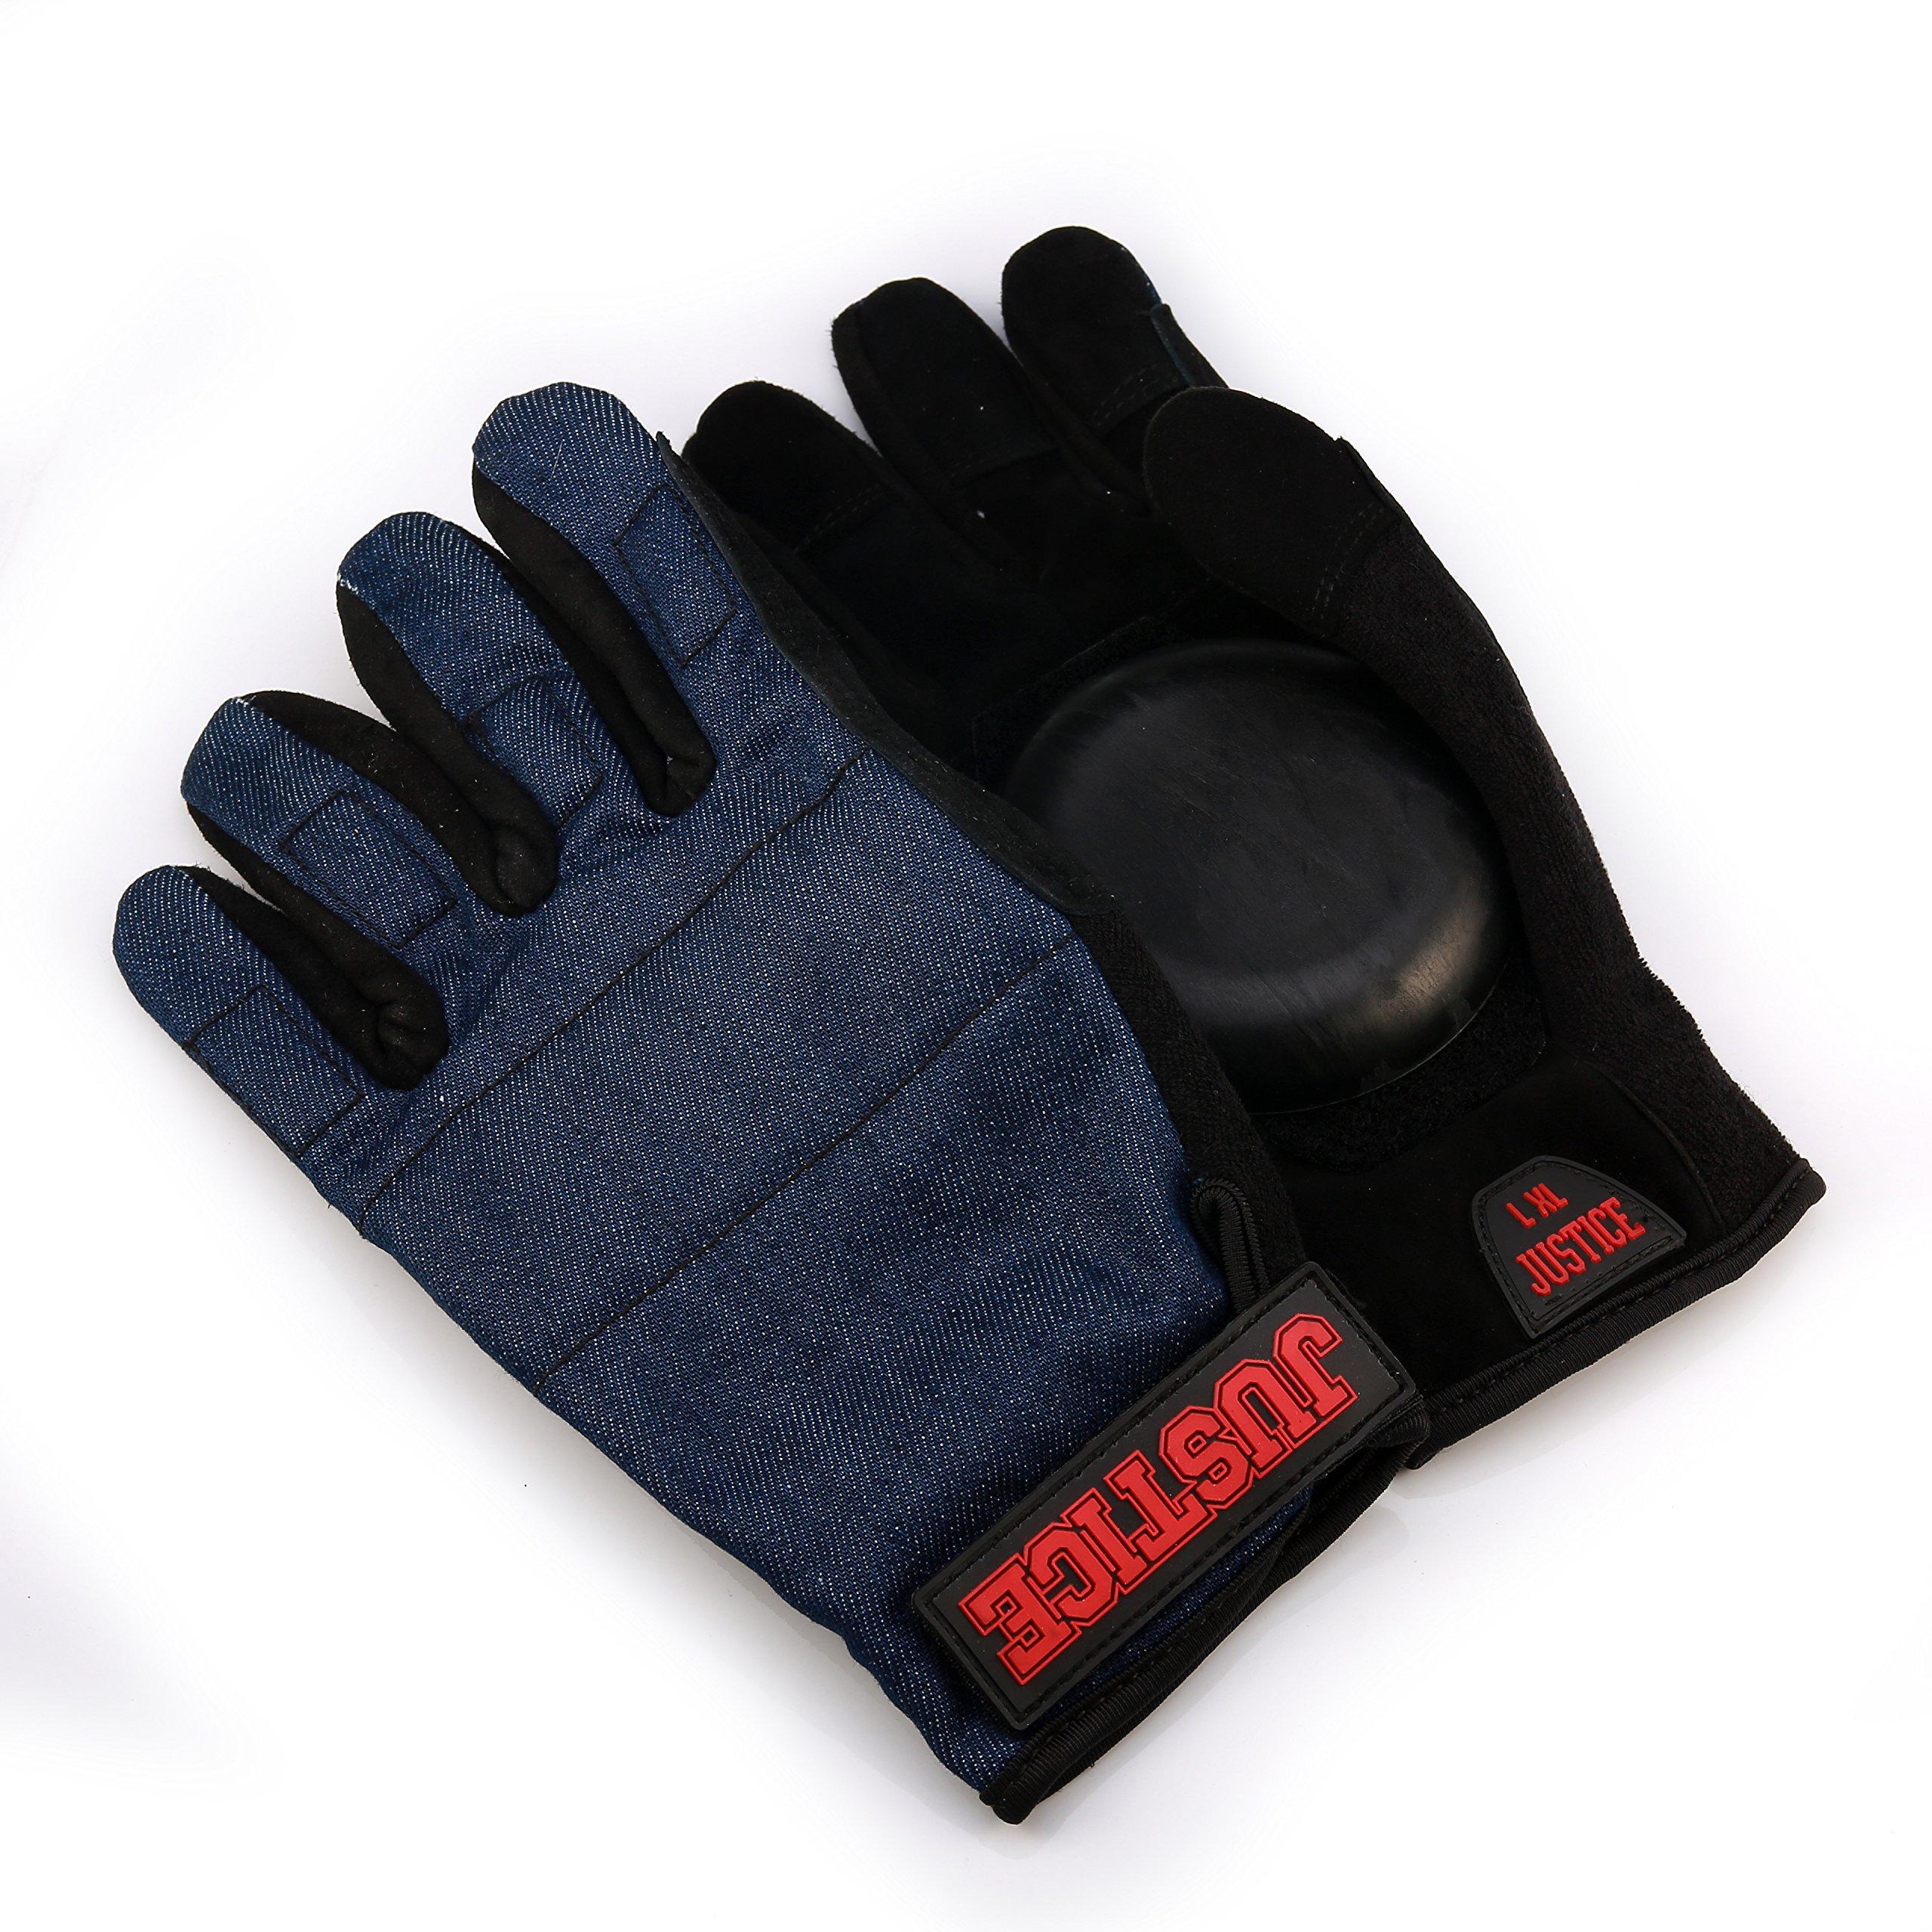 Andux Land Leather Gloves Skateboard HBST-06 (Blue, S/M)